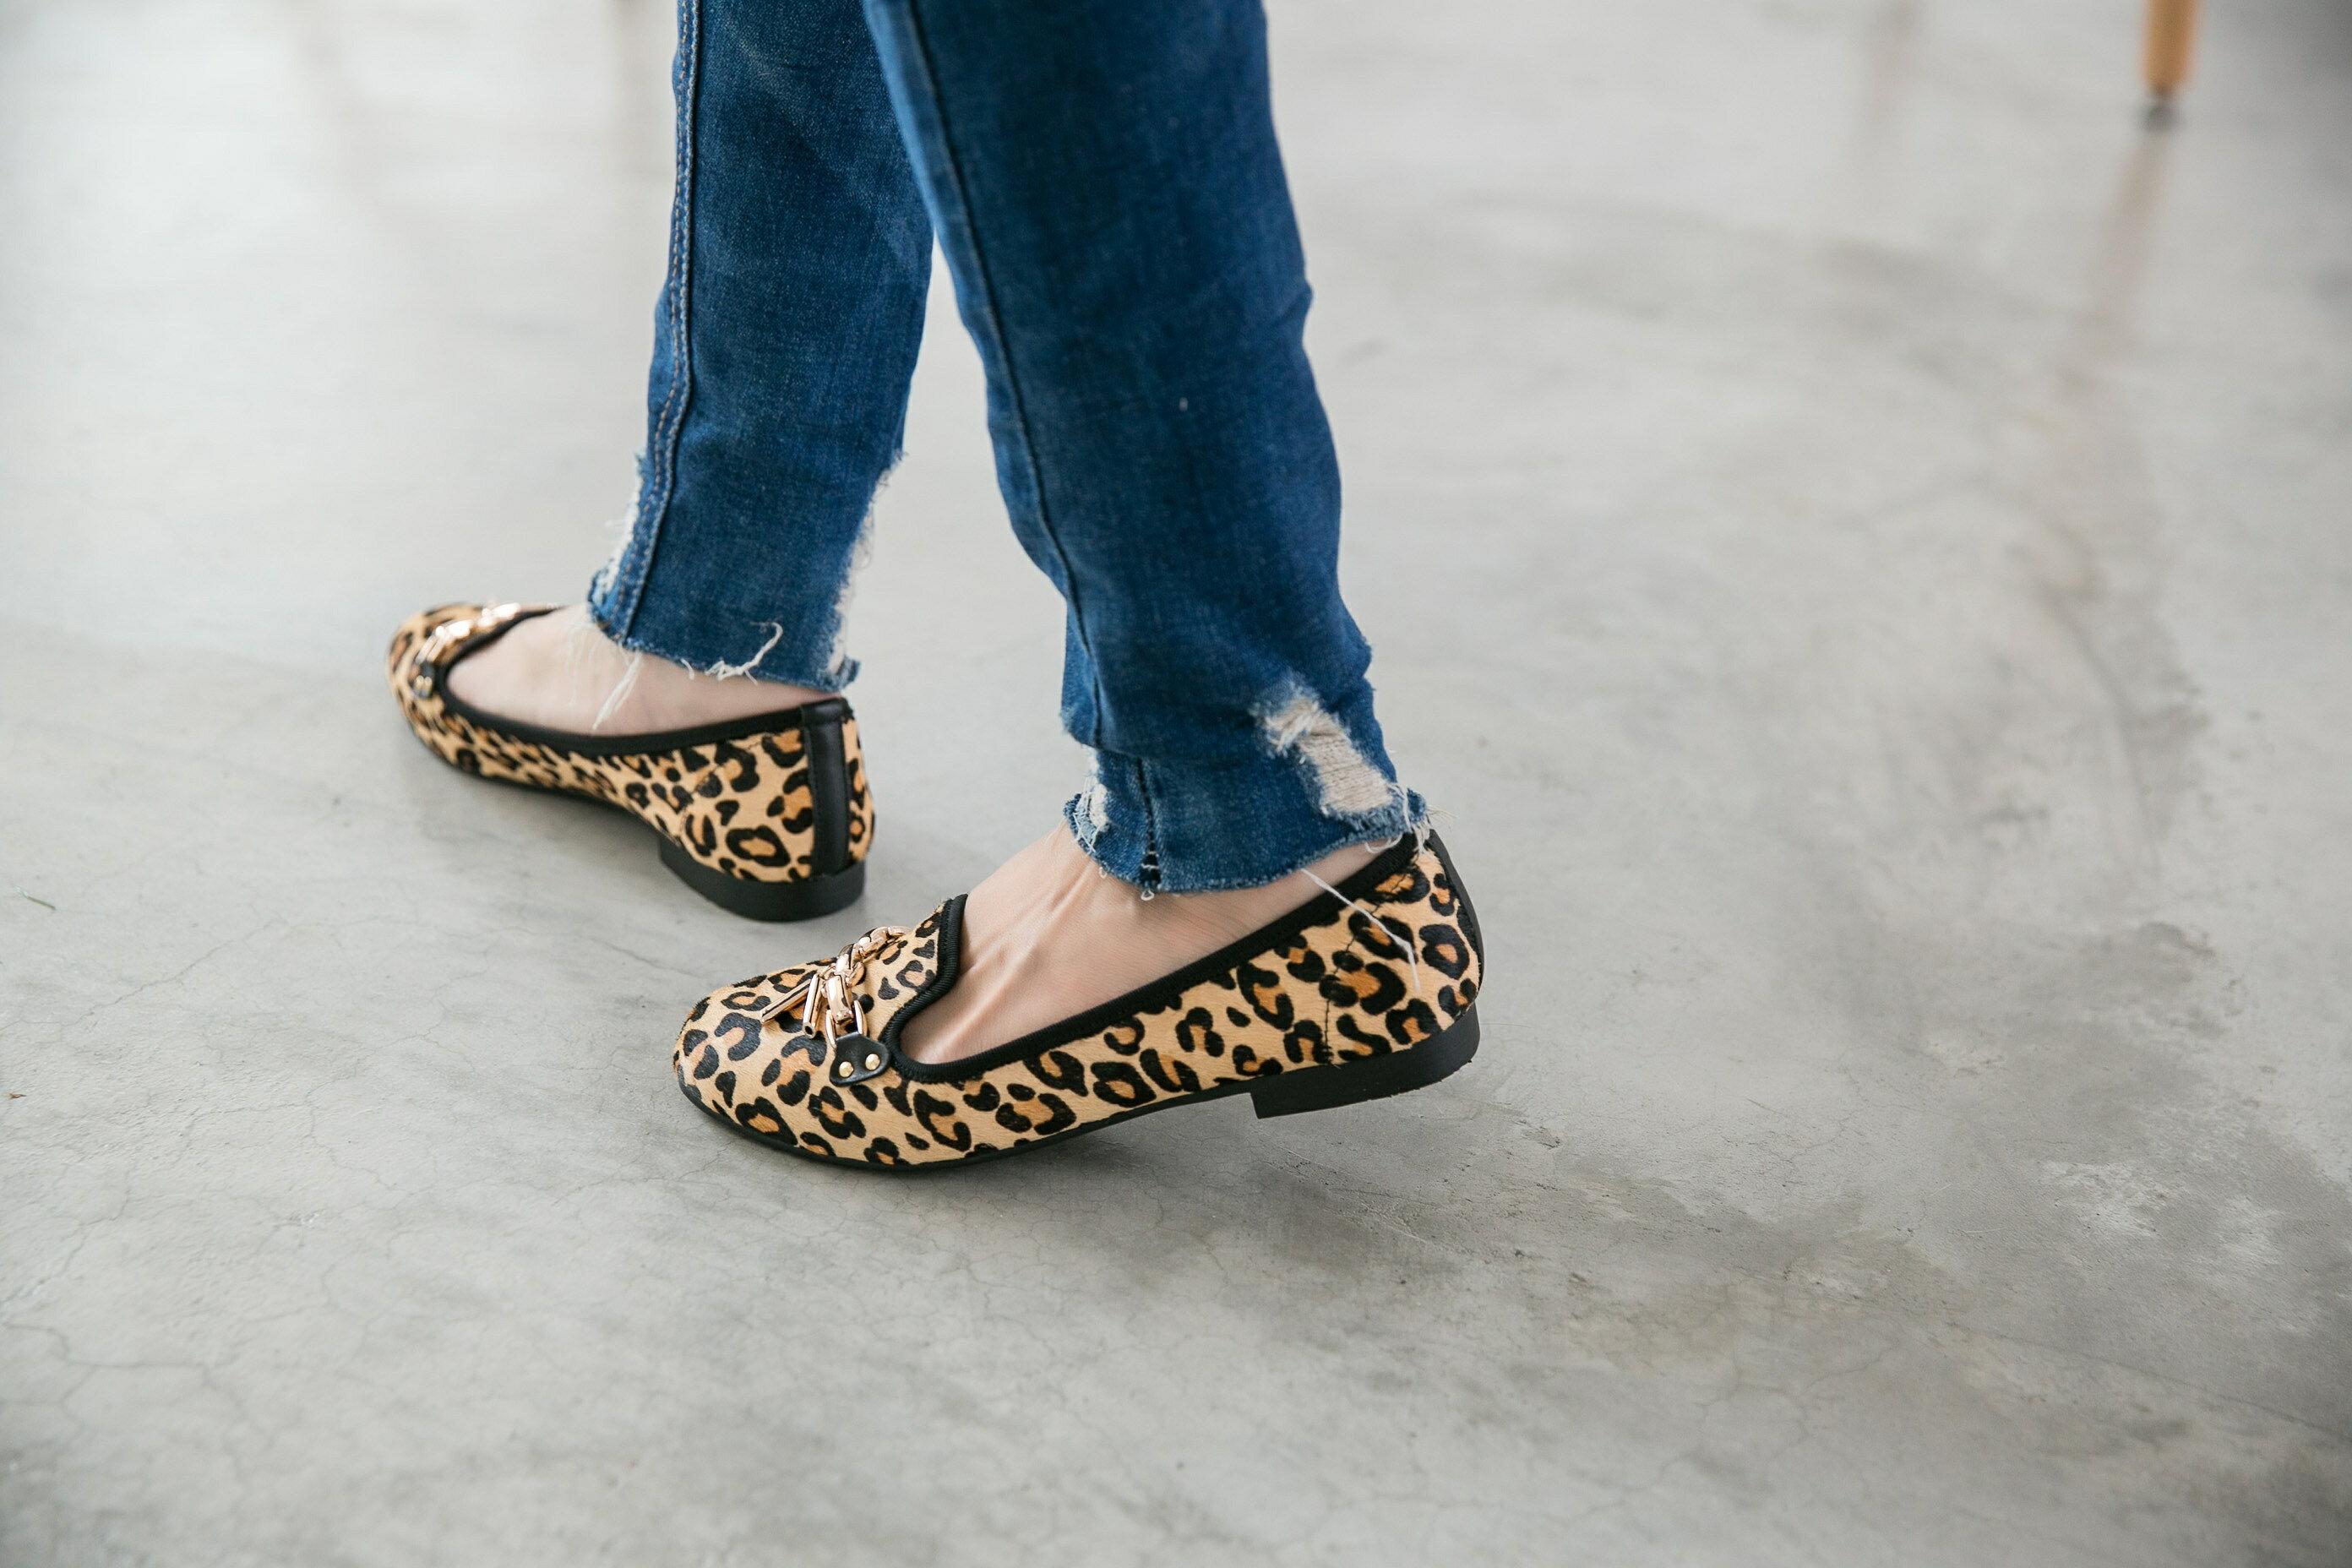 Aimez La Vie 真皮馬毛豹紋金屬鍊樂福鞋 1